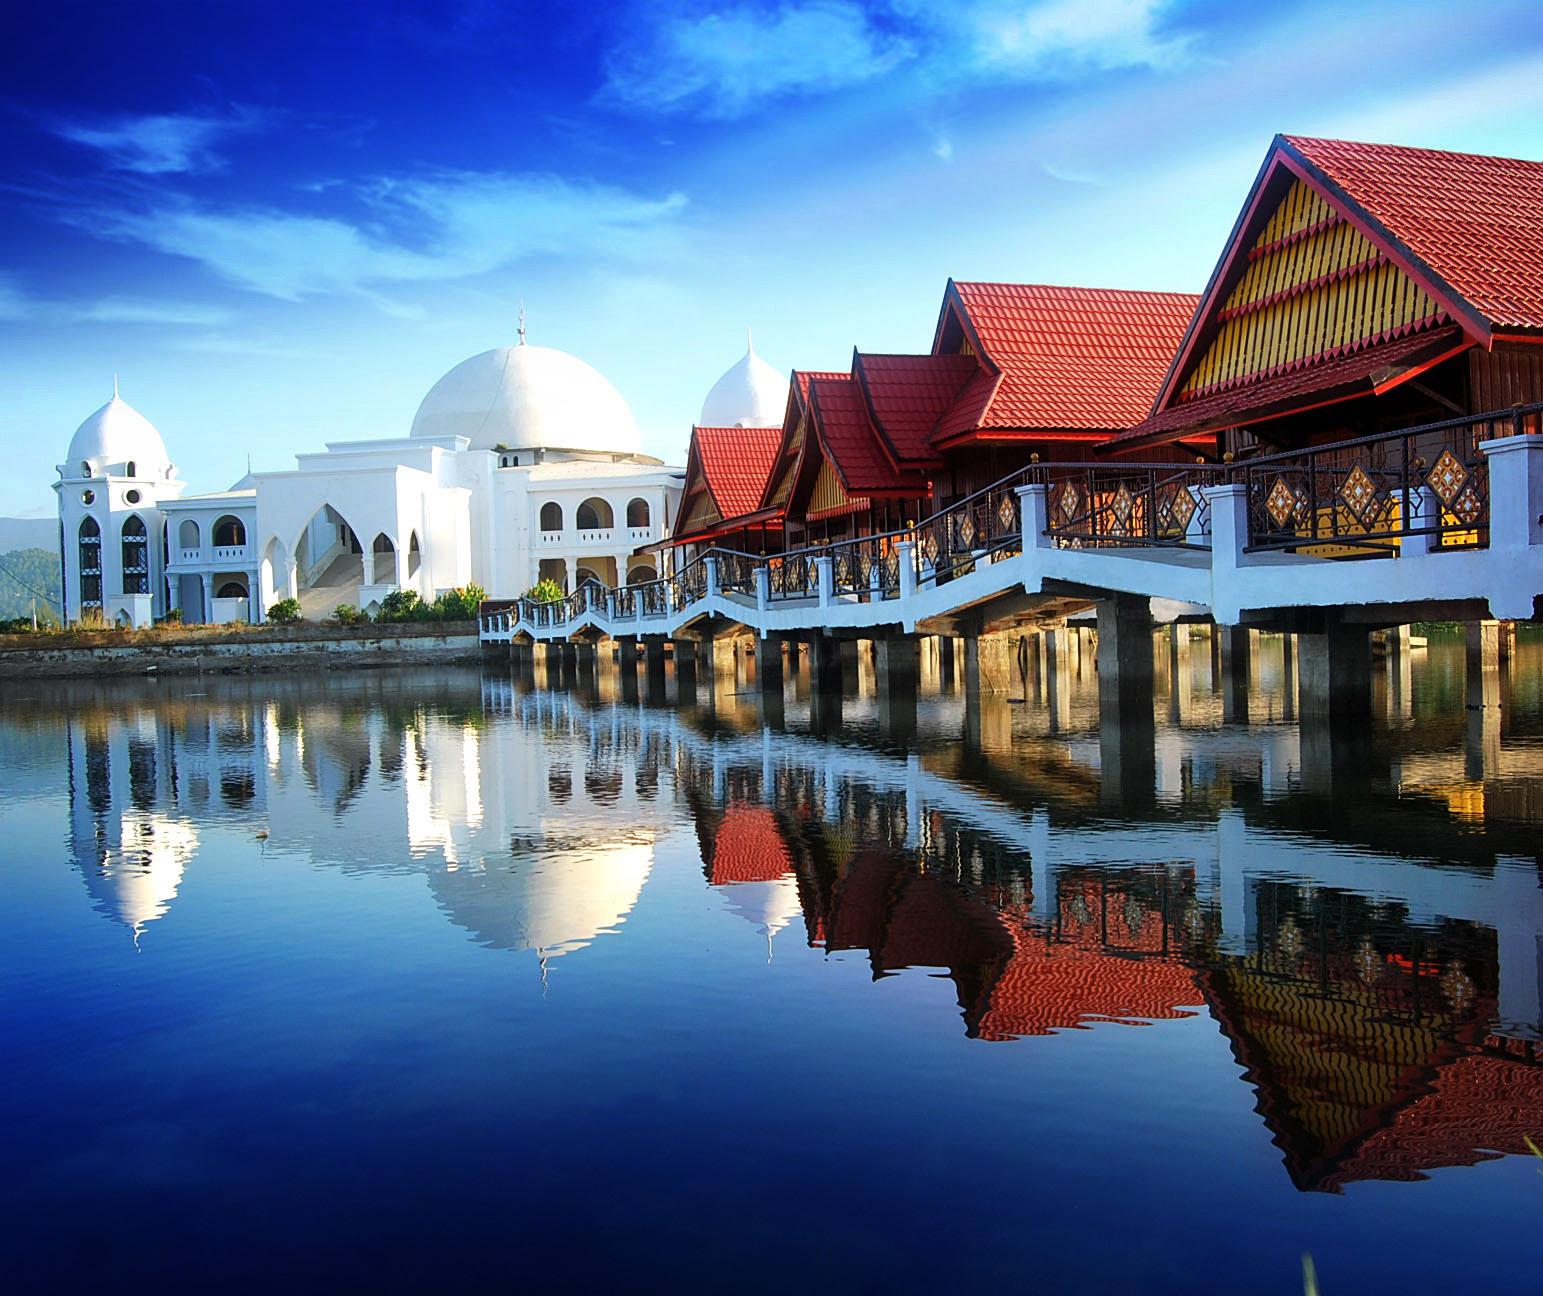 Welcome Arfah Psikologi Sejarah Kota Kolaka Atau Kota